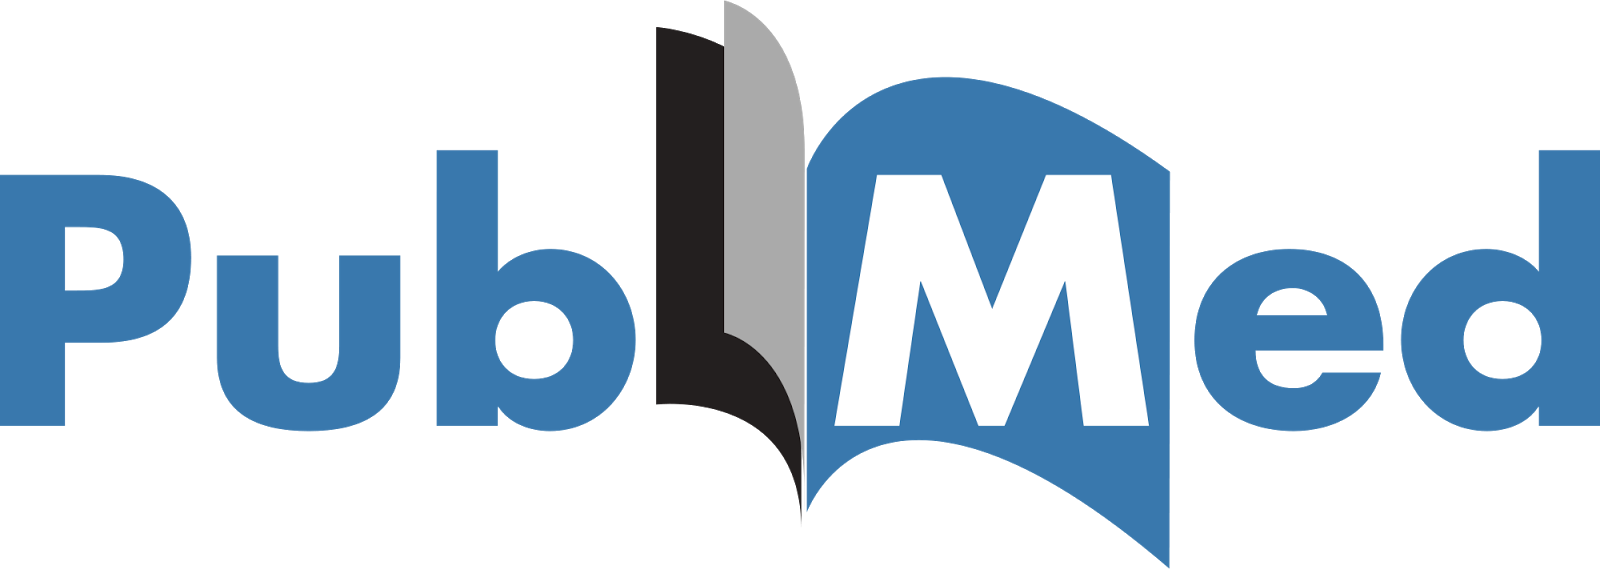 Database PubMed